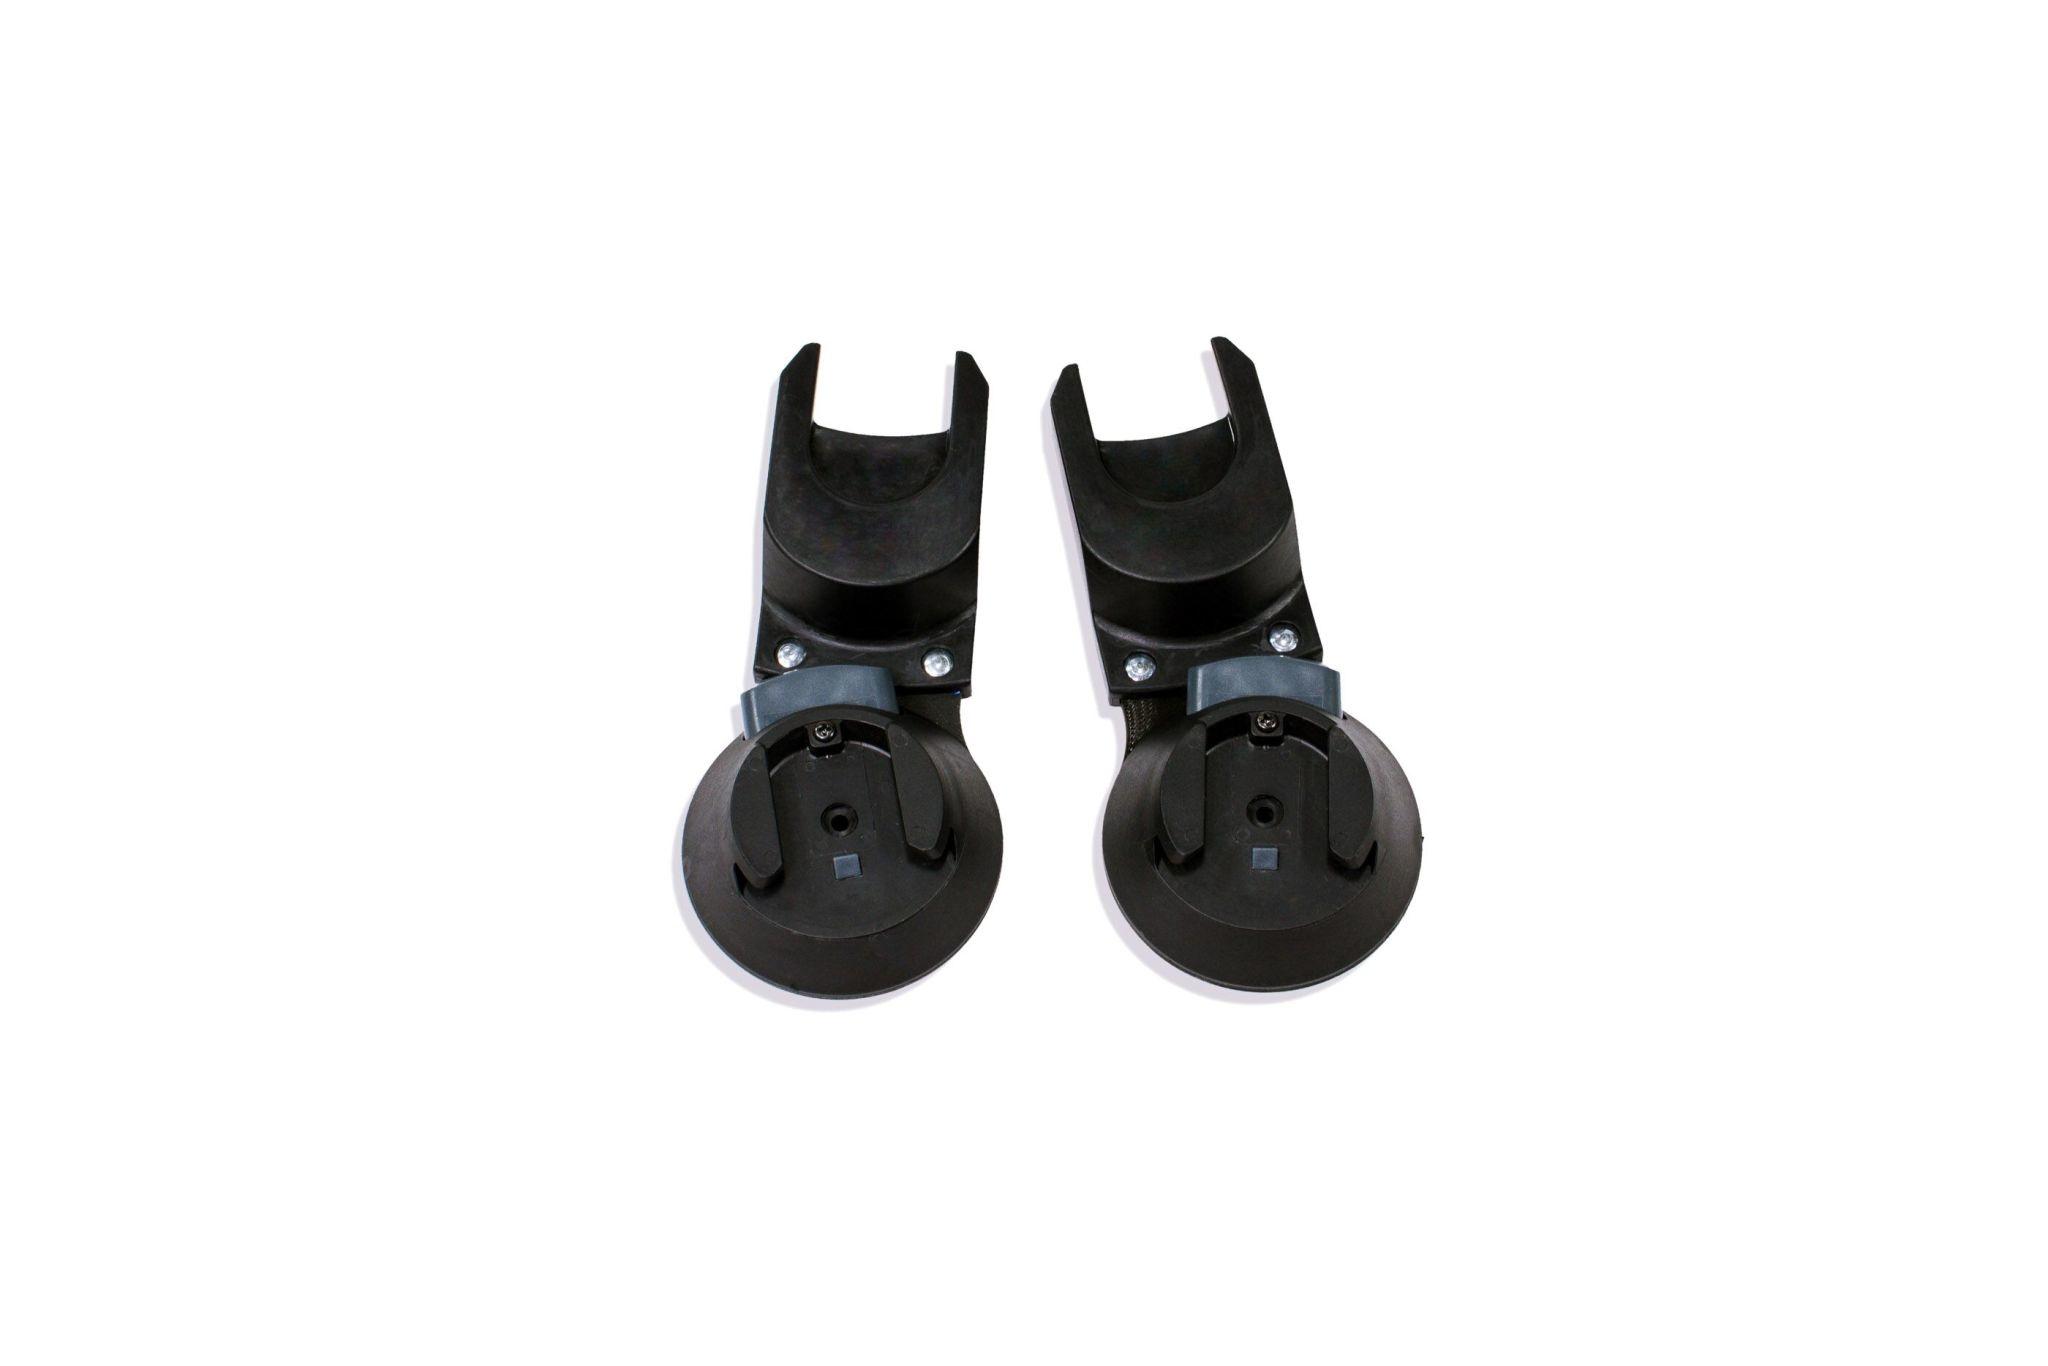 Bumbleride Bumbleride Indie/Speed Clek/Maxi/Nuna/Cybex Car Seat Adapter